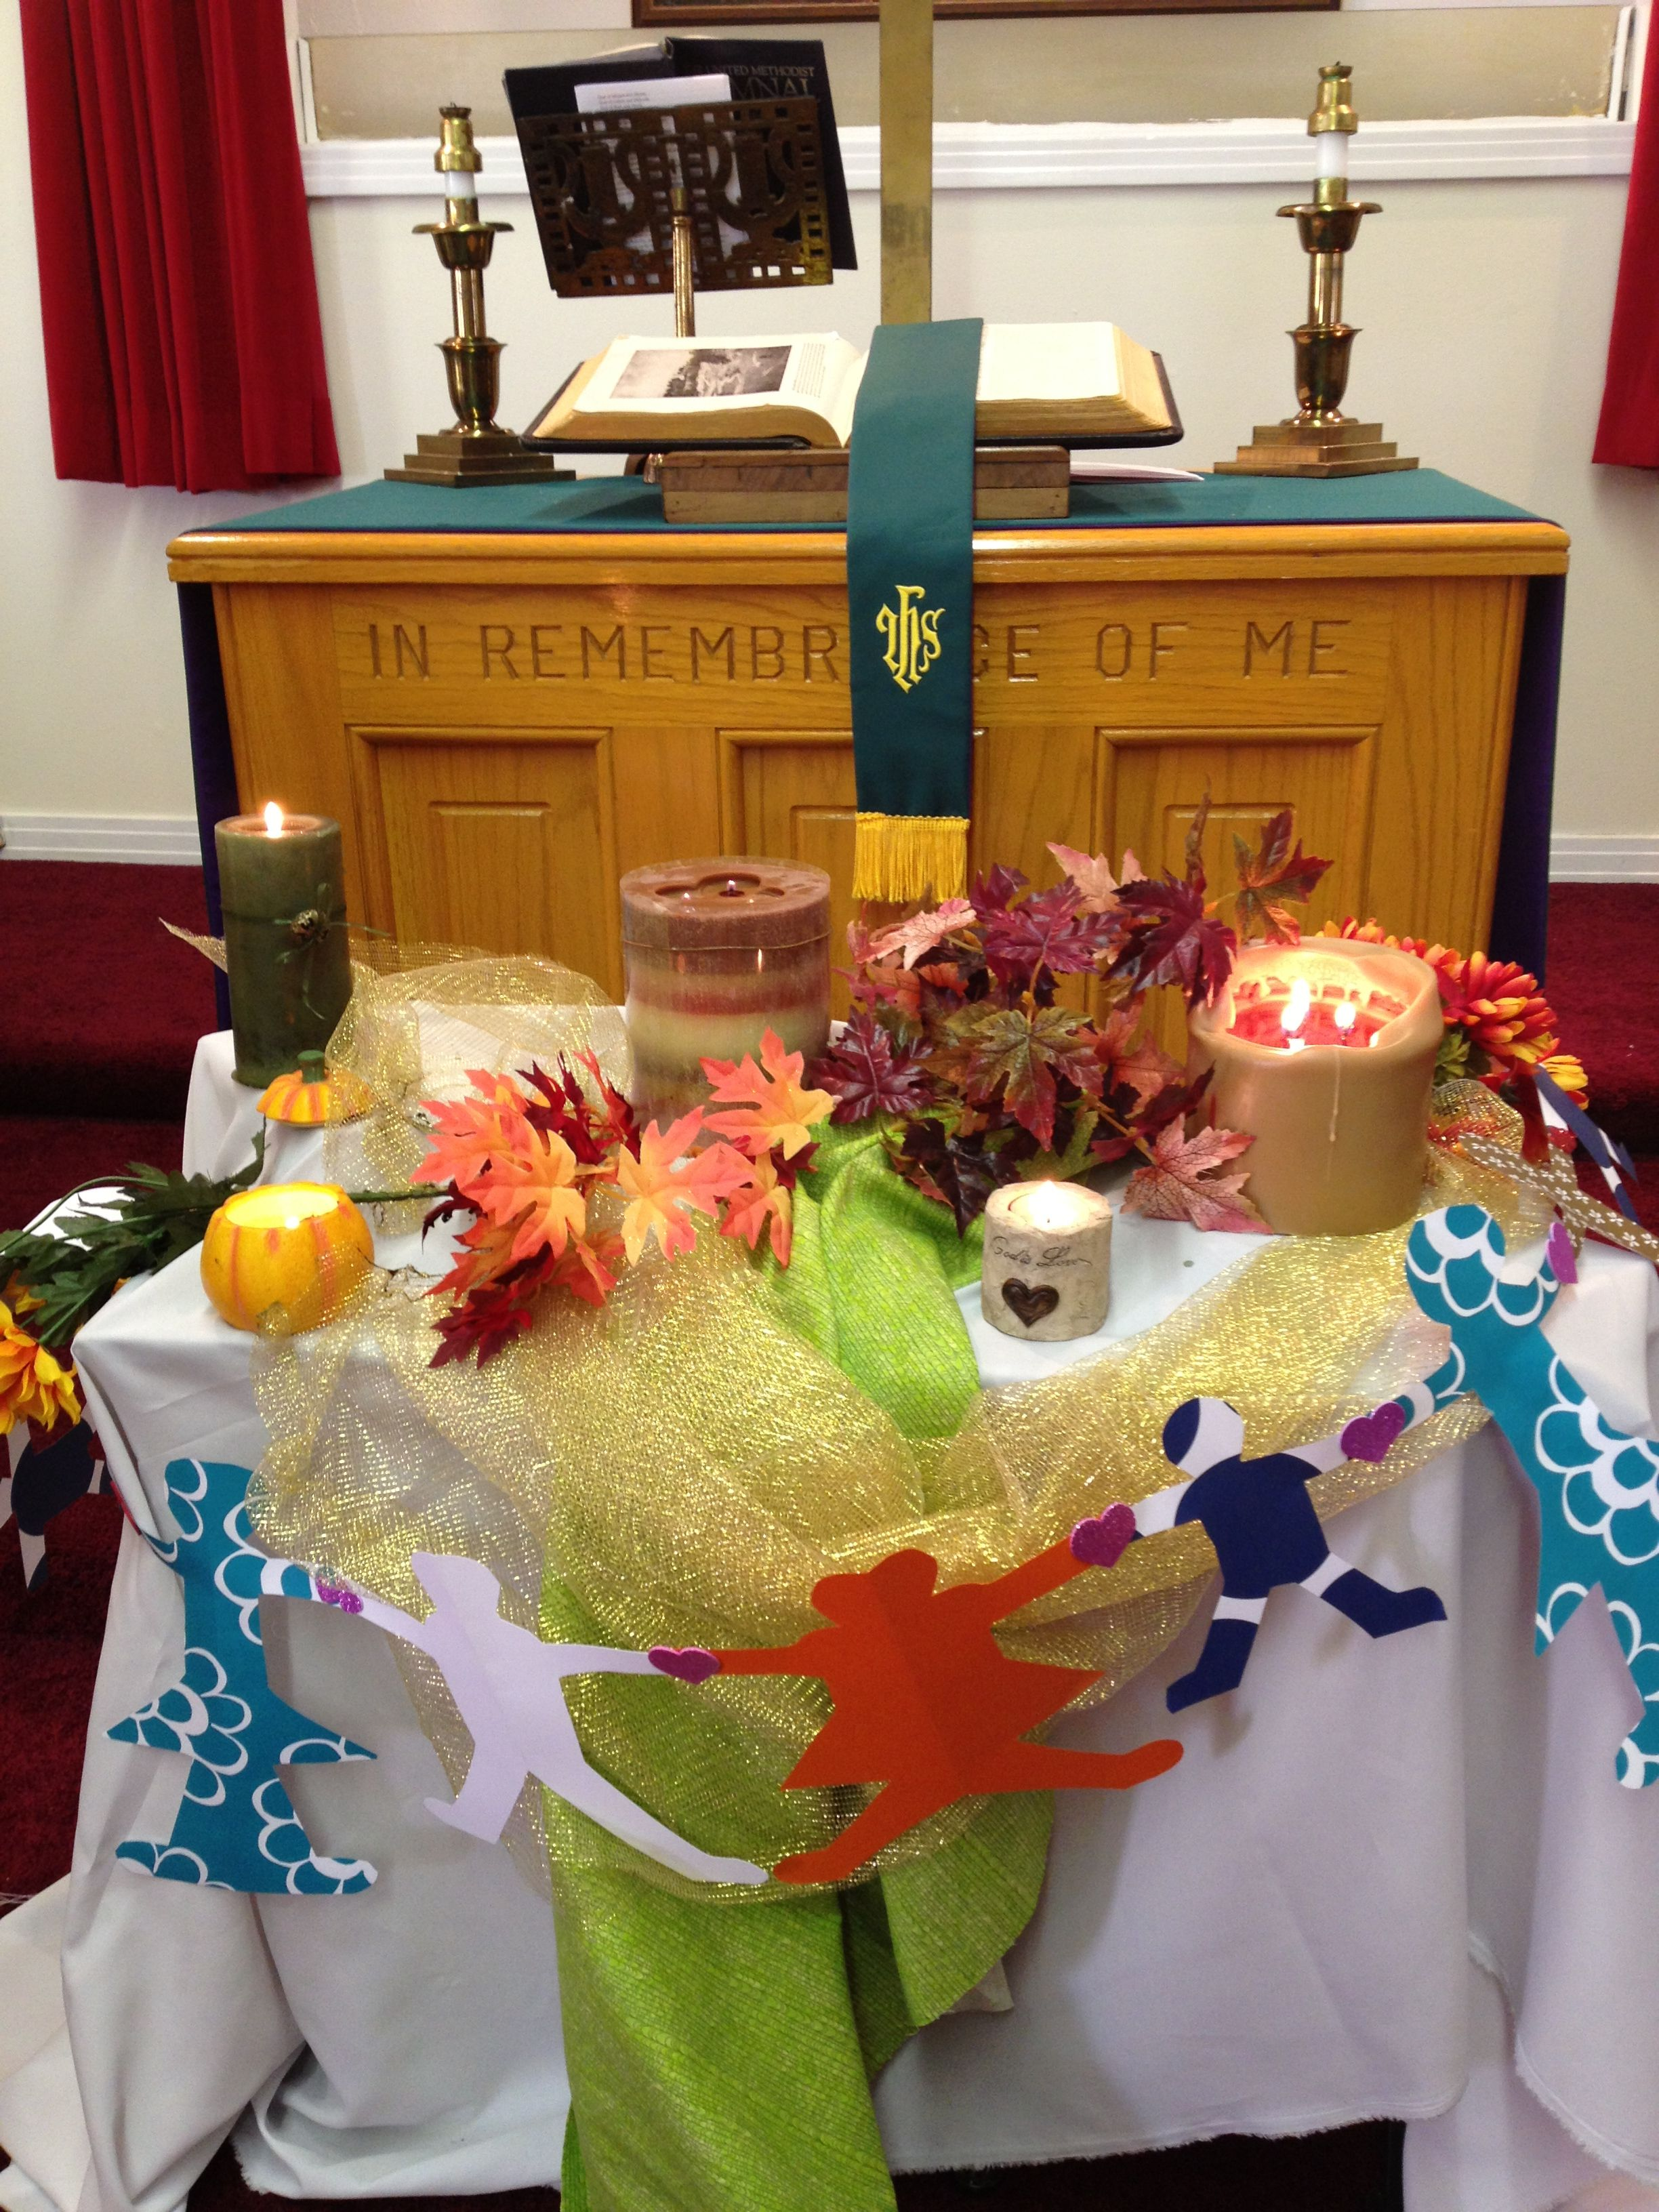 Worship display for All Saints.